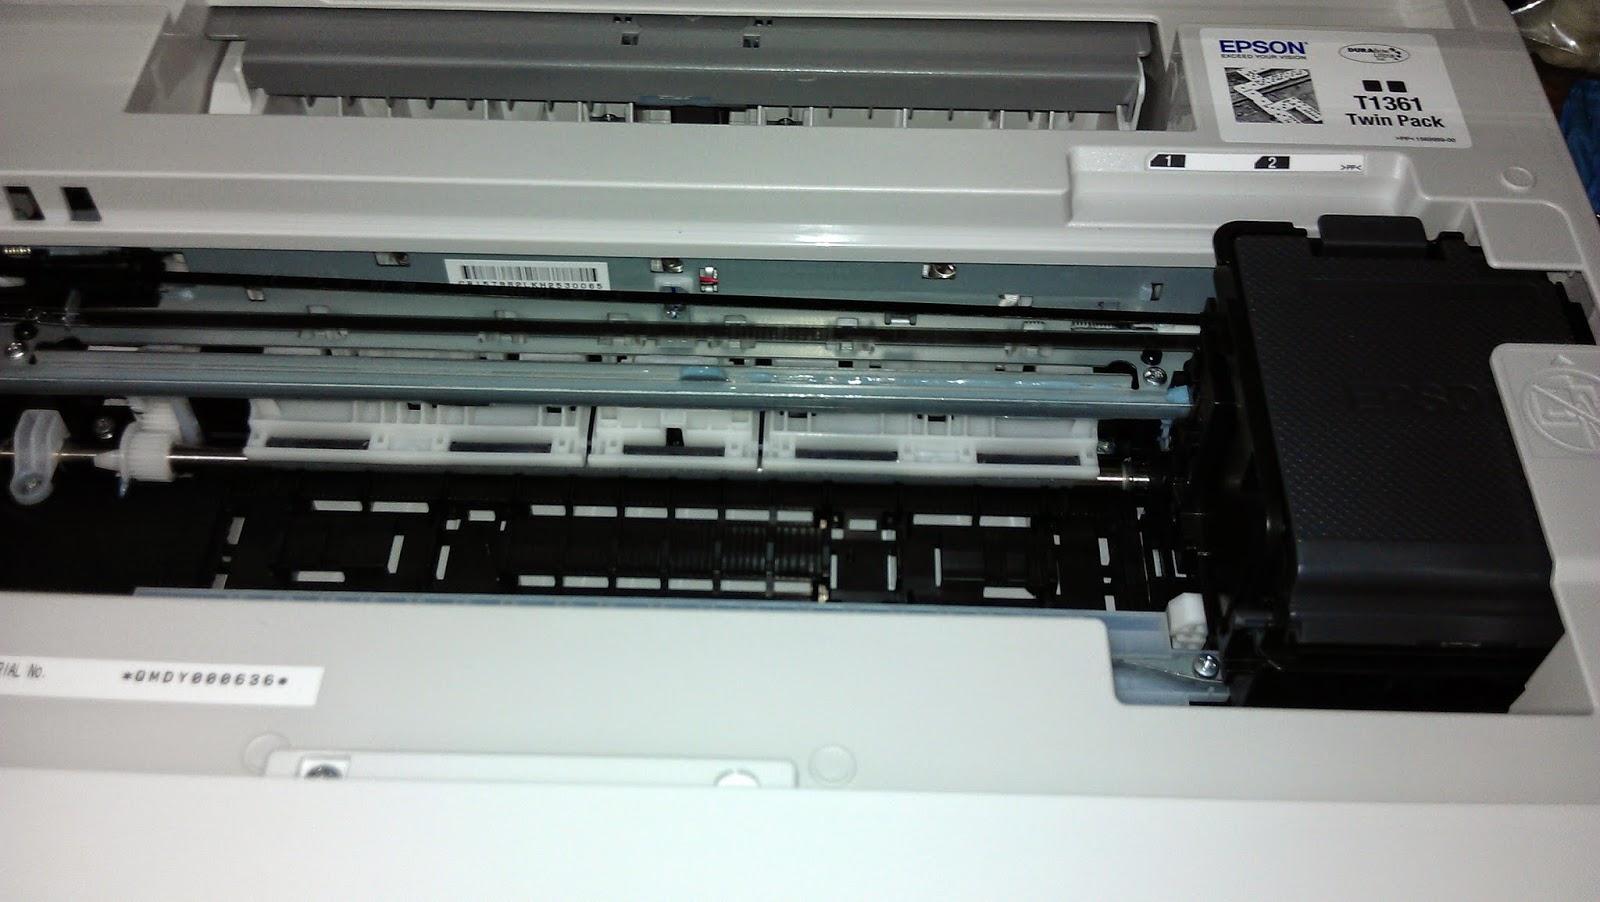 Ремонт принтера canon mp250 своими руками